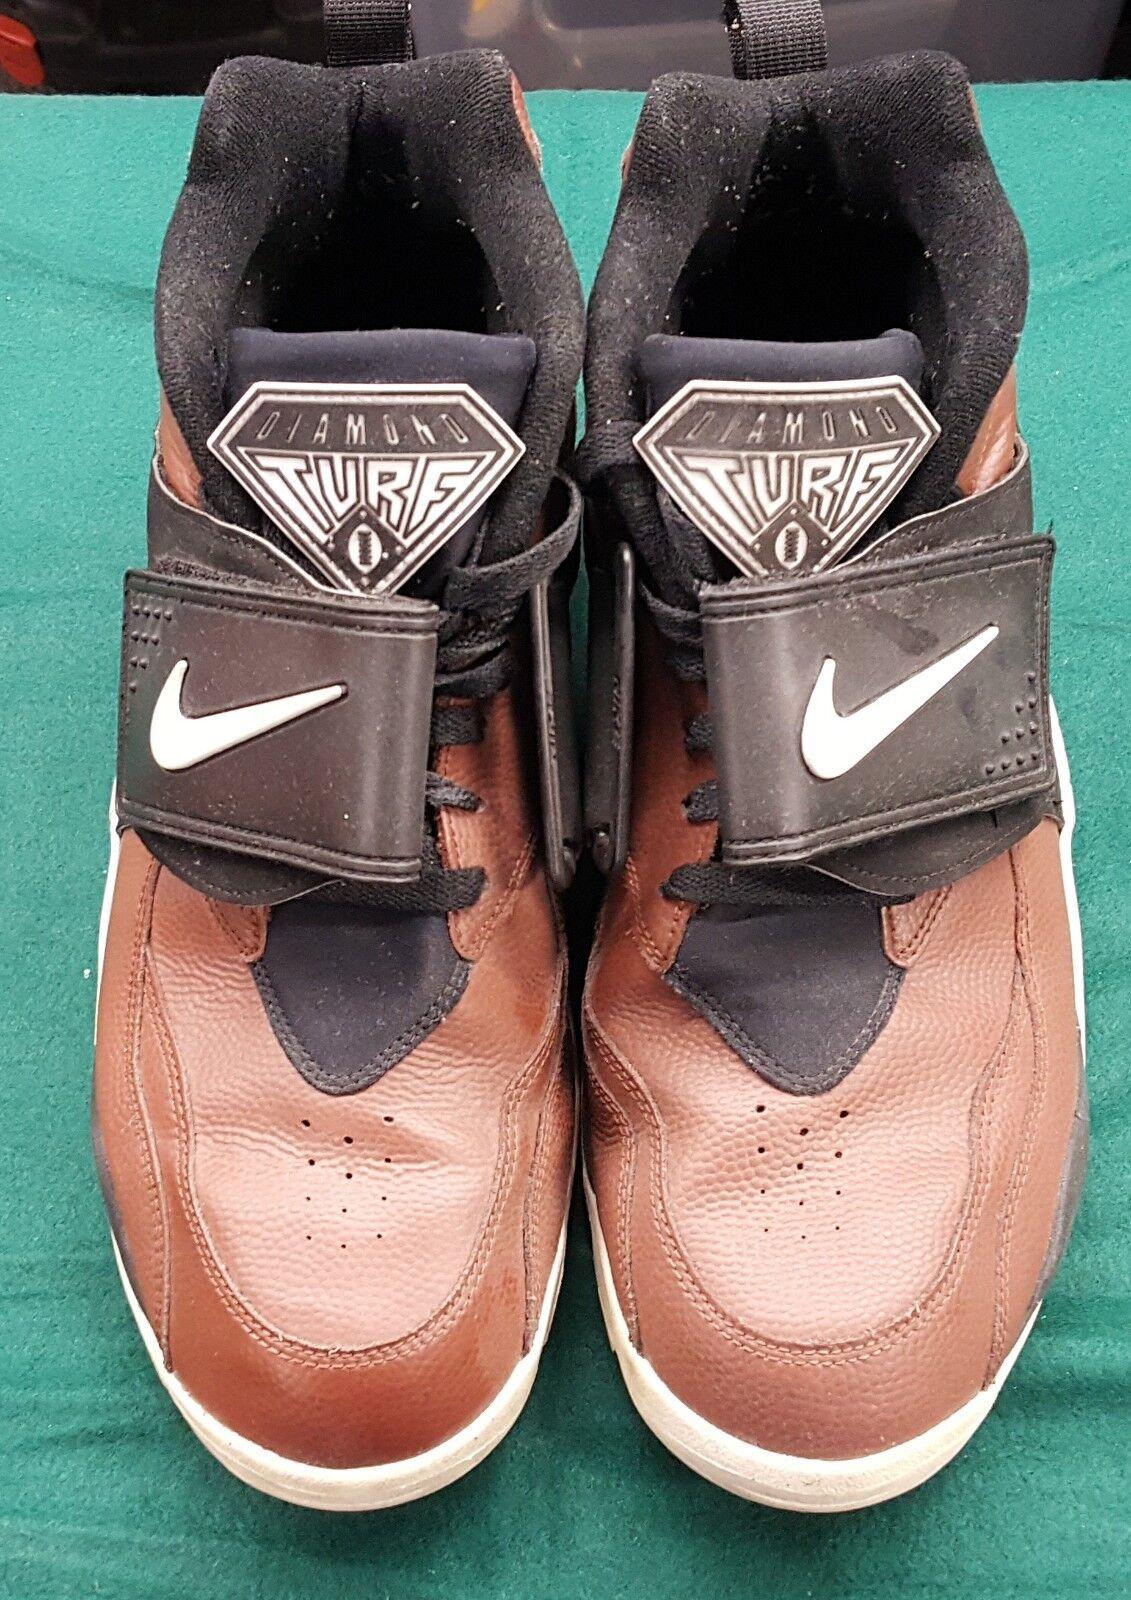 Nike Air Diamond Turf  Deion Sanders  shoes 309434-200 Size 12 Field Brown Black